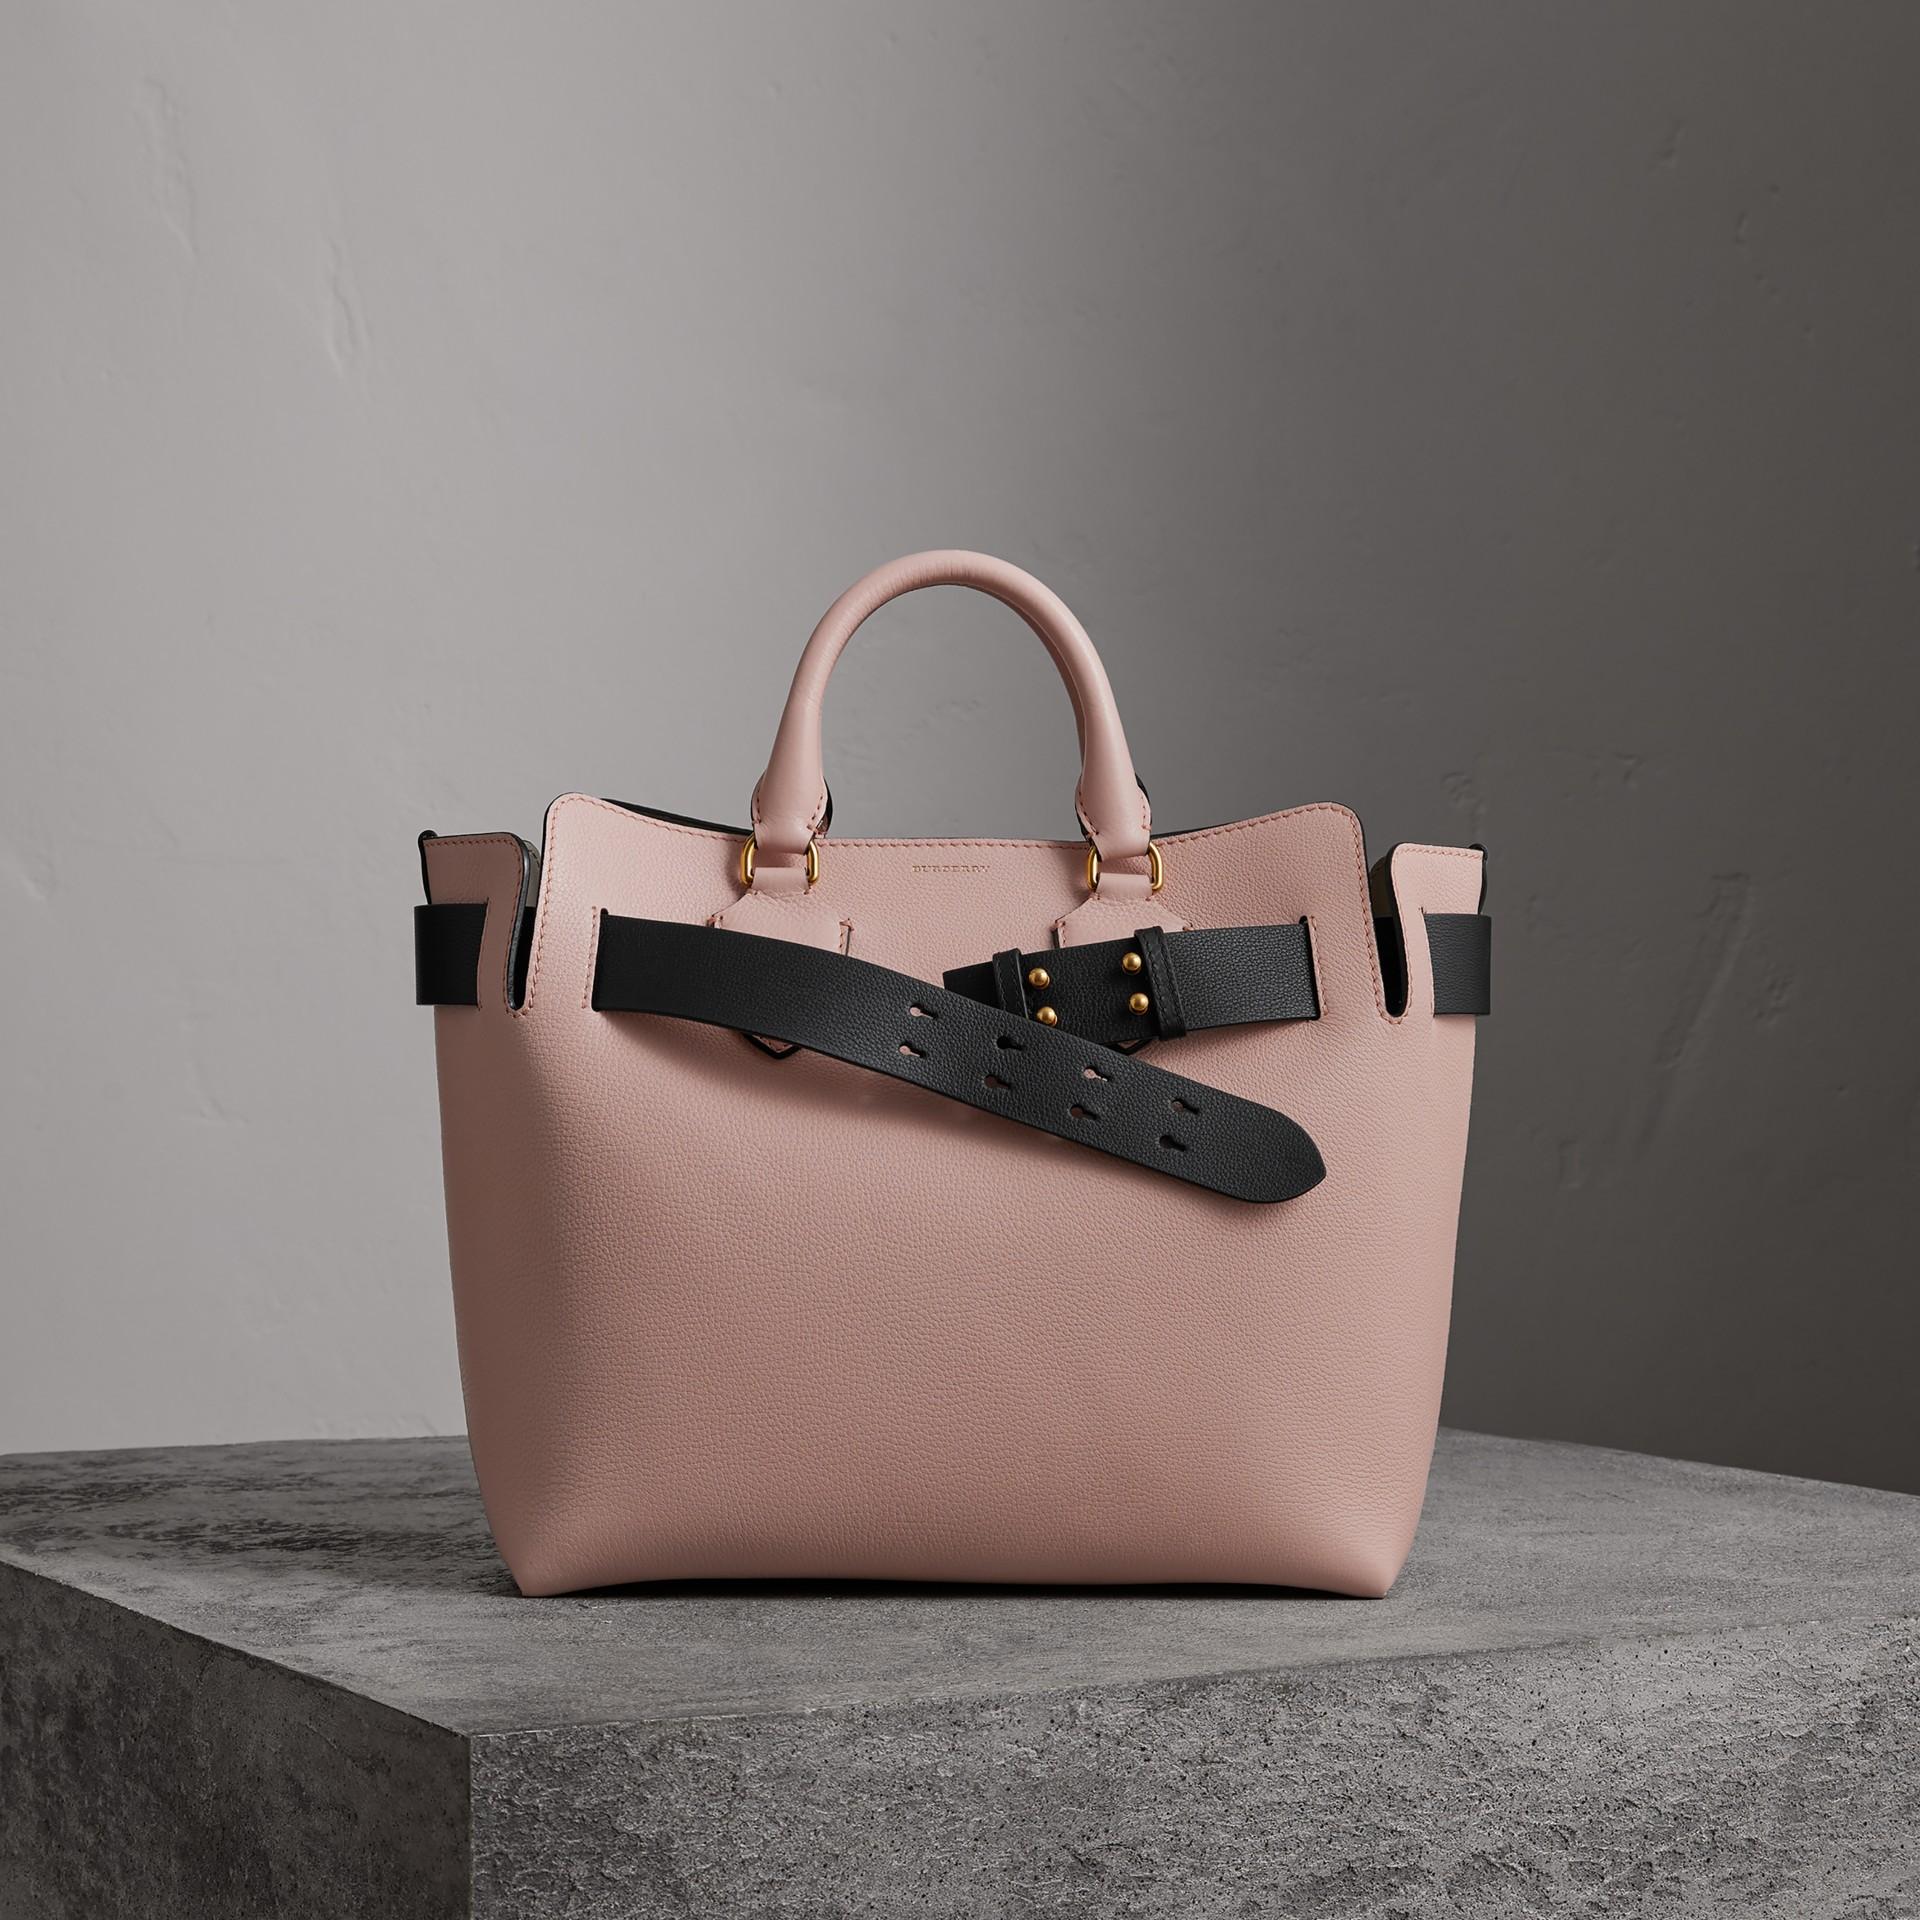 Burberry The Medium Leather Belt Bag In Pale Ash Rose   ModeSens a009922e47